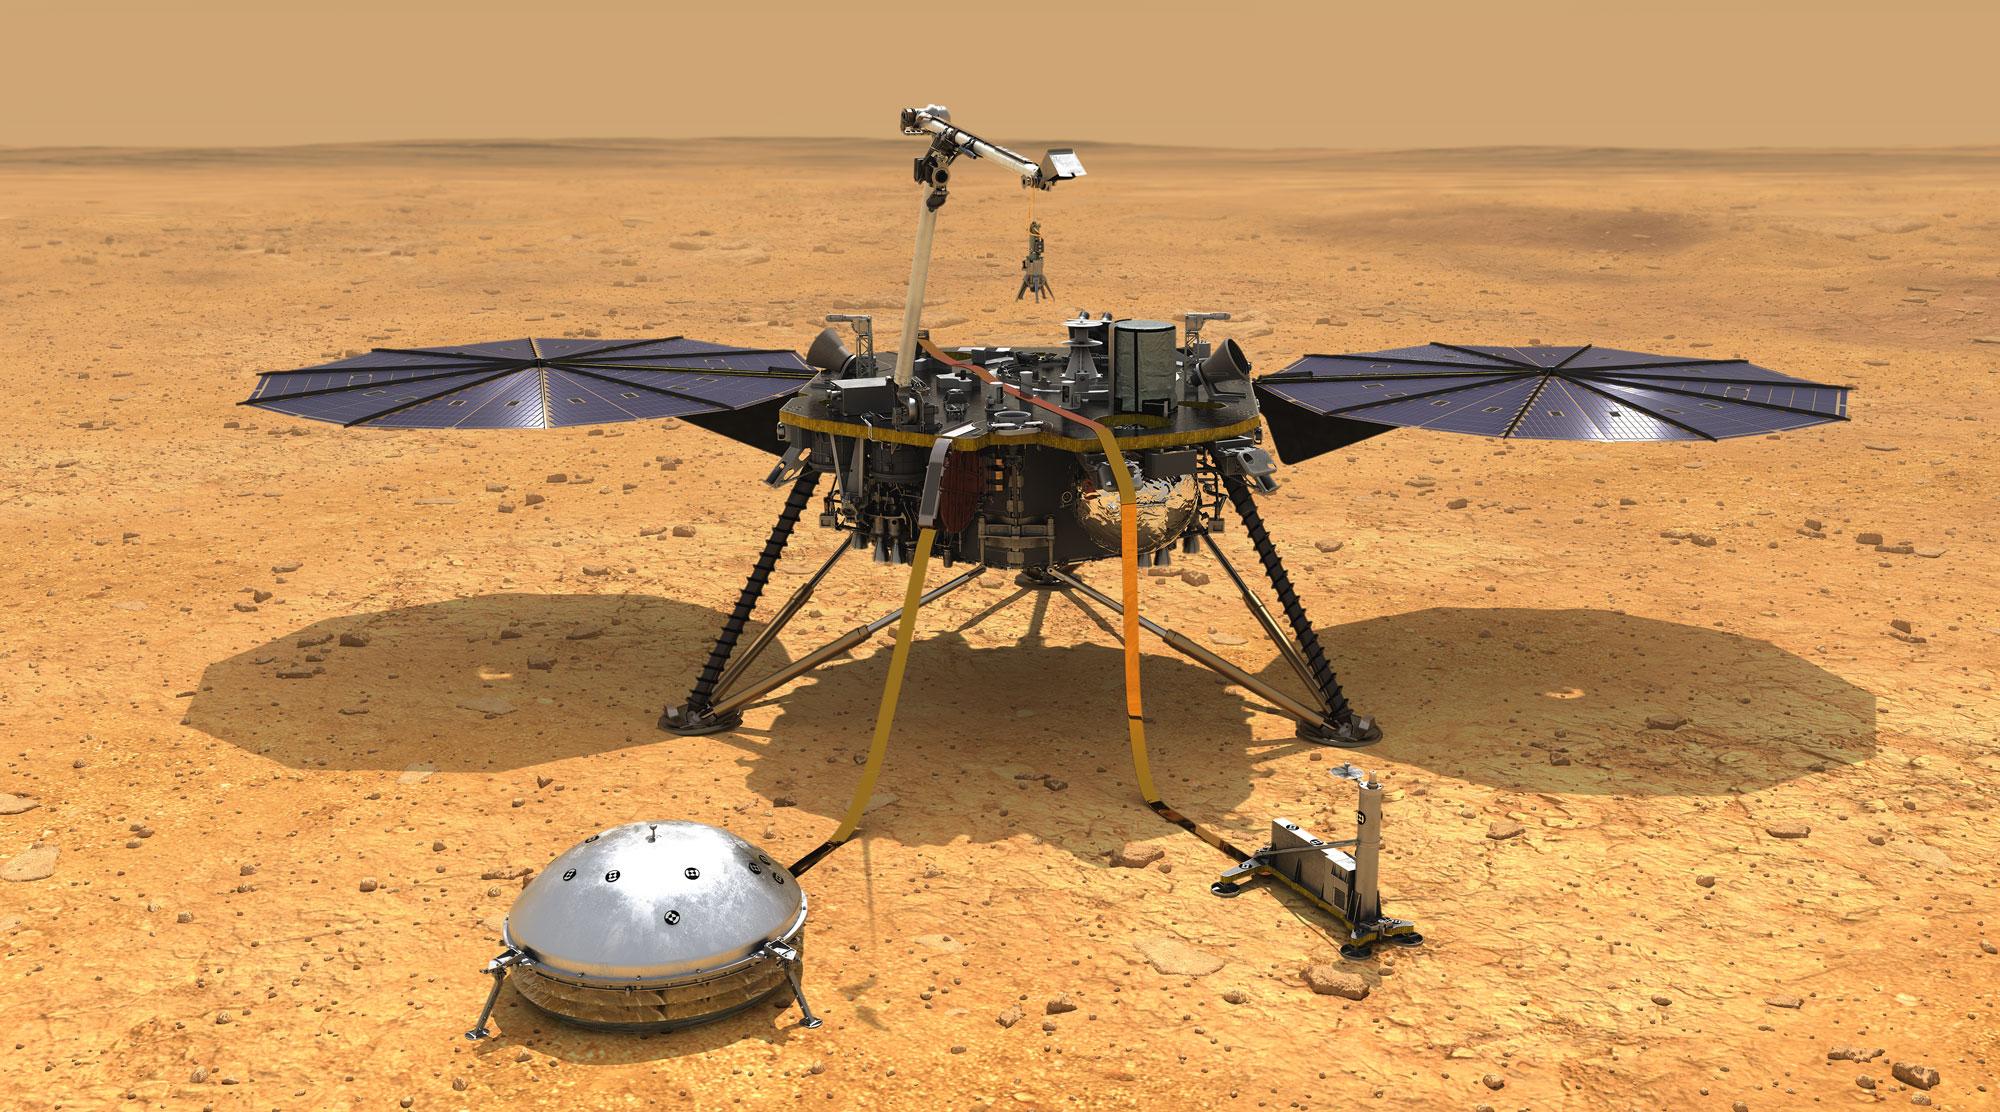 Photo: Mars InSight Spacecraft